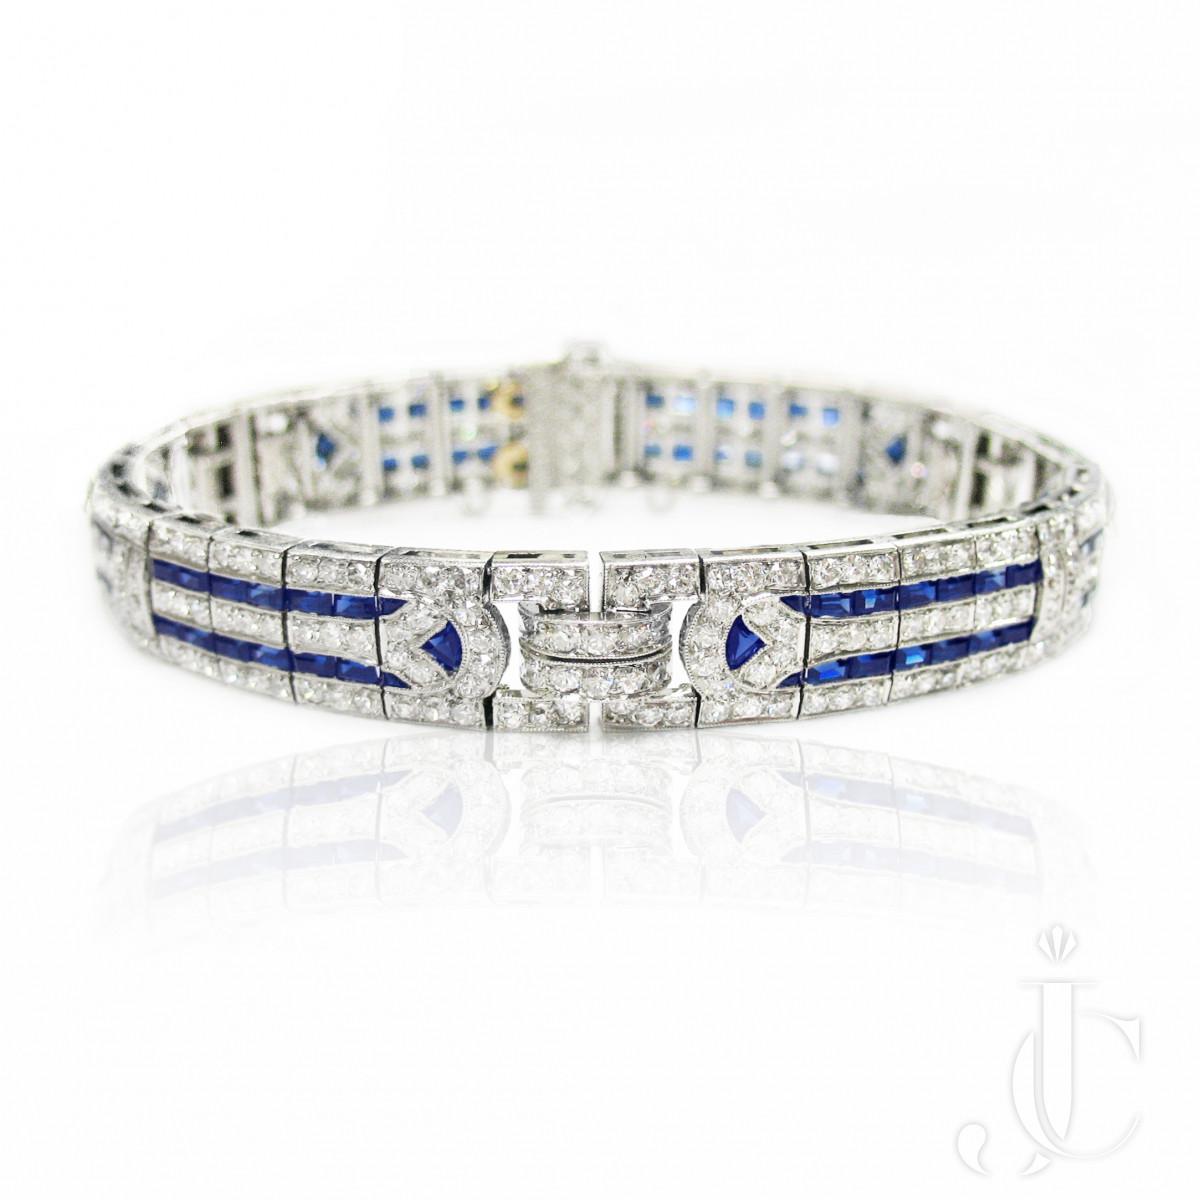 Tiffany Art Deco Platinum Sapphire and Diamond Bracelet